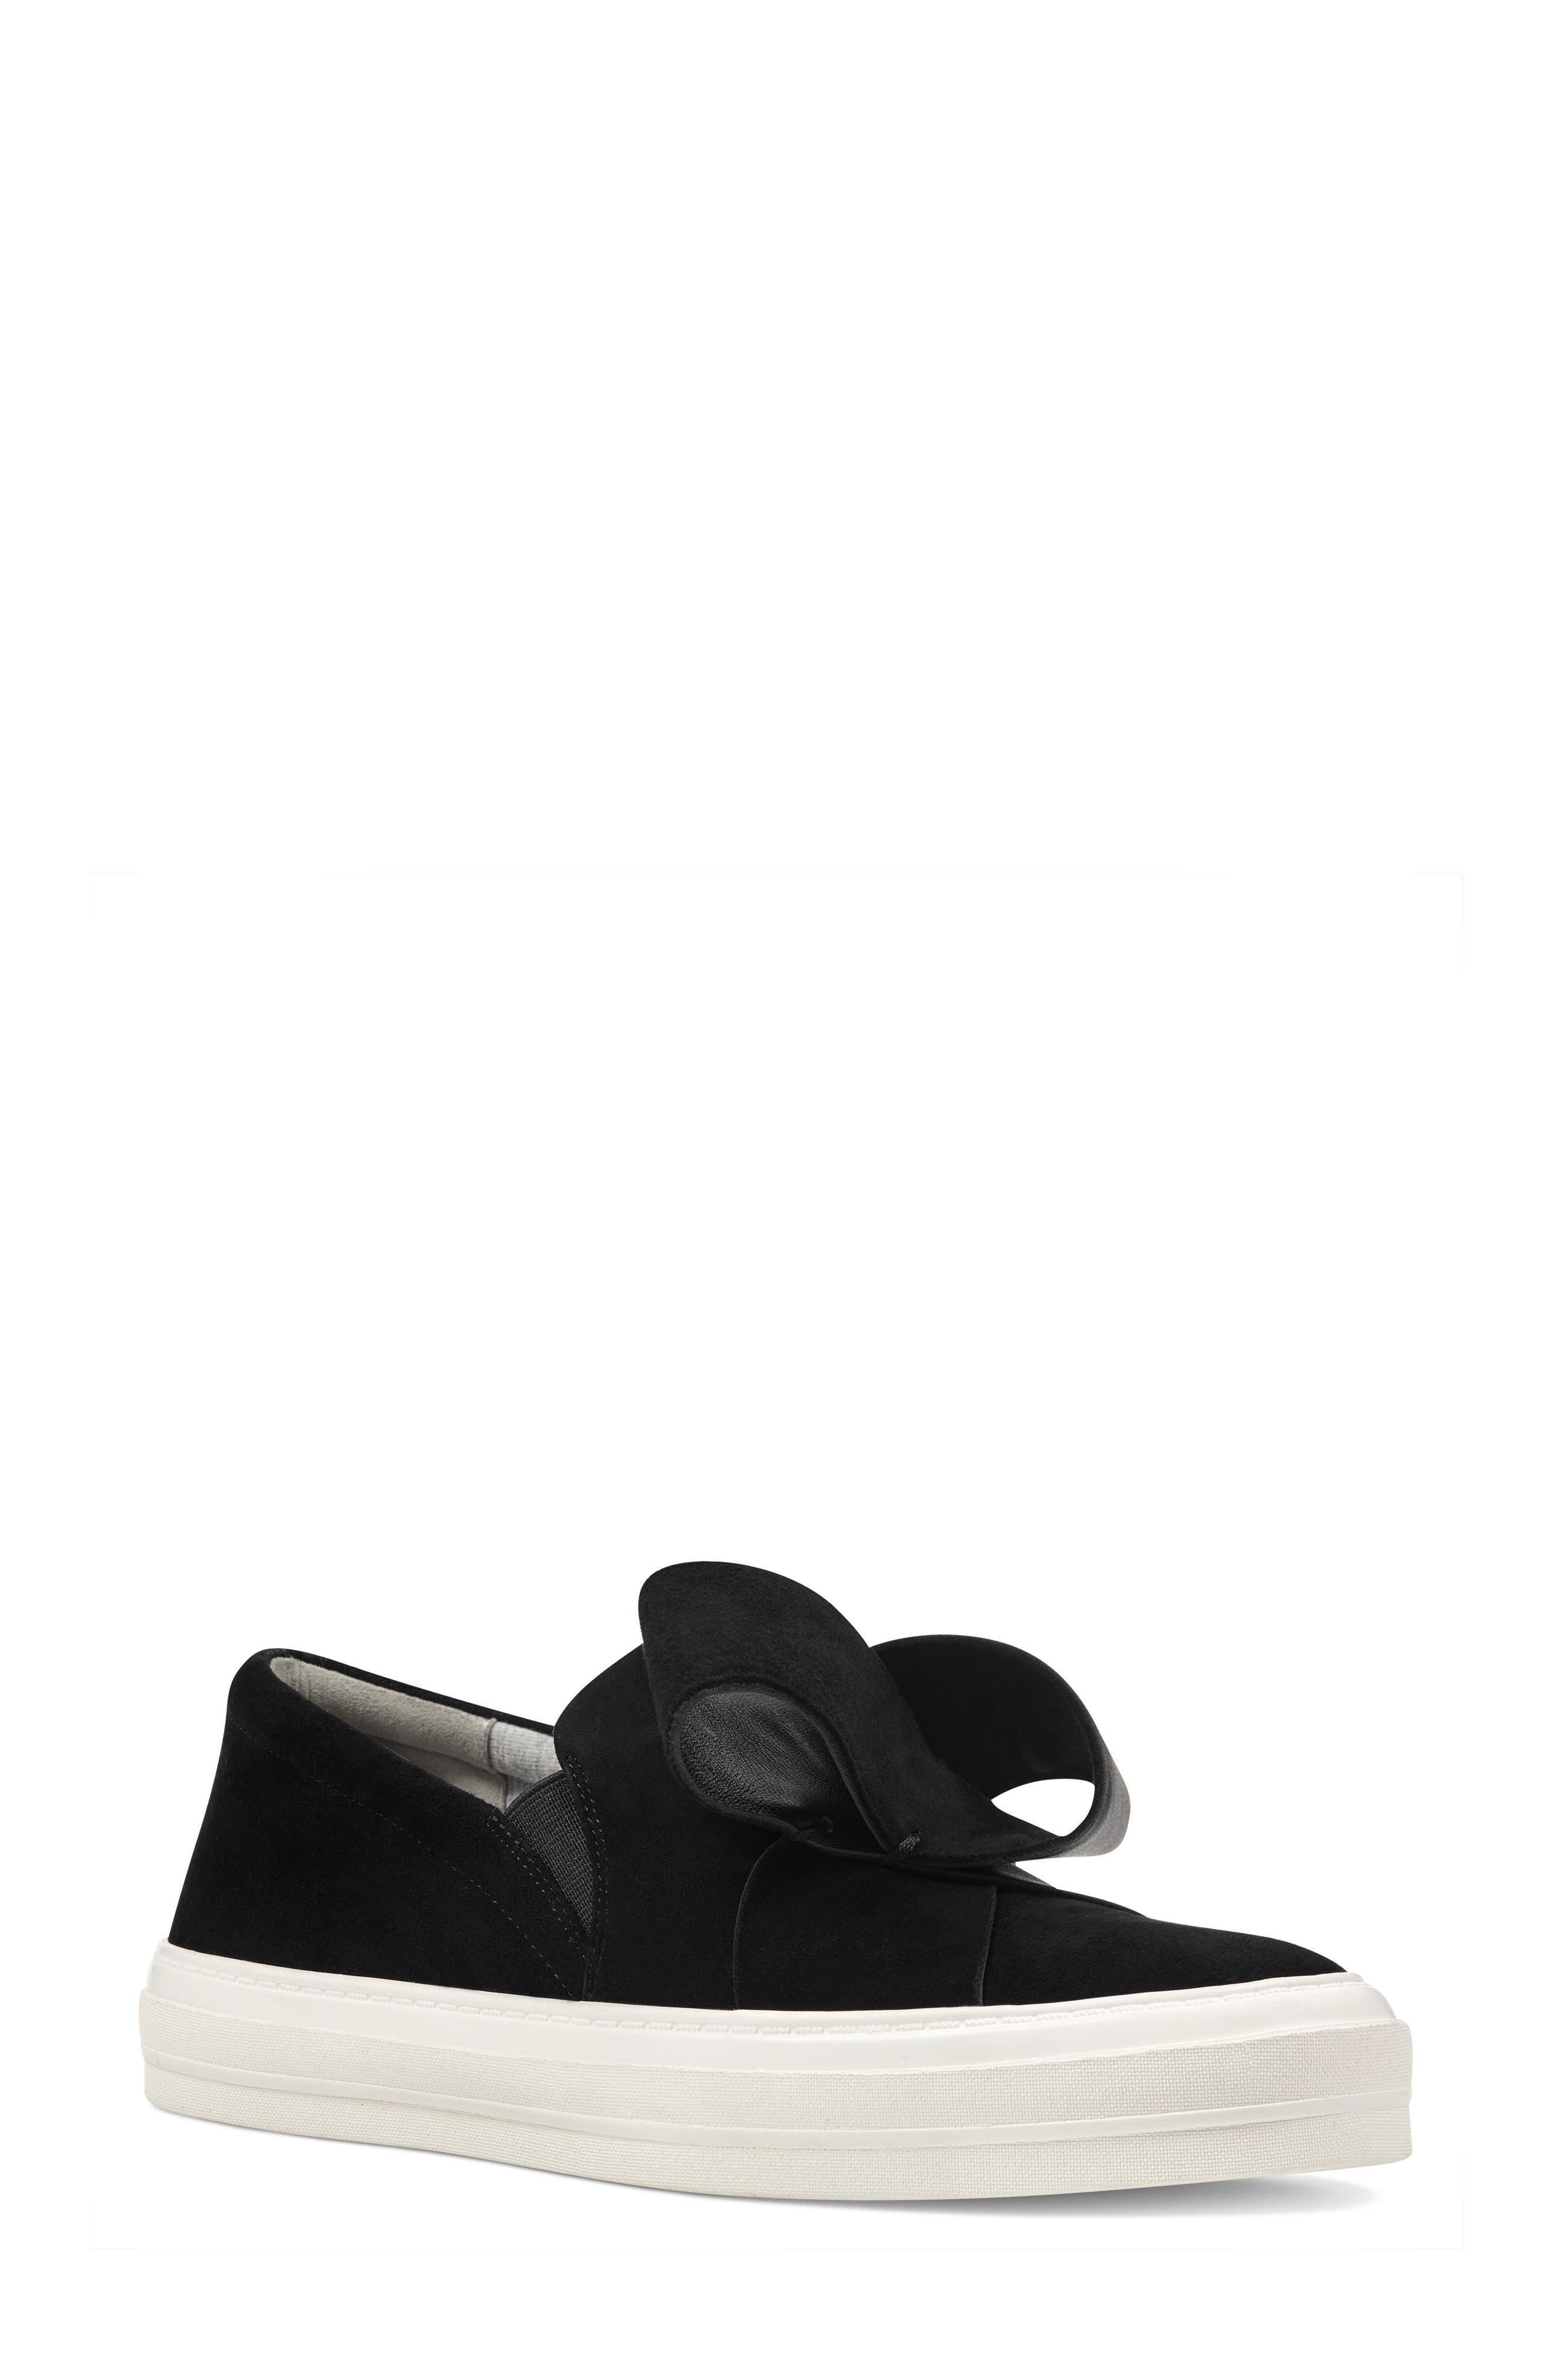 Odienella Slip-On Sneaker,                             Main thumbnail 1, color,                             BLACK MULTI SUEDE